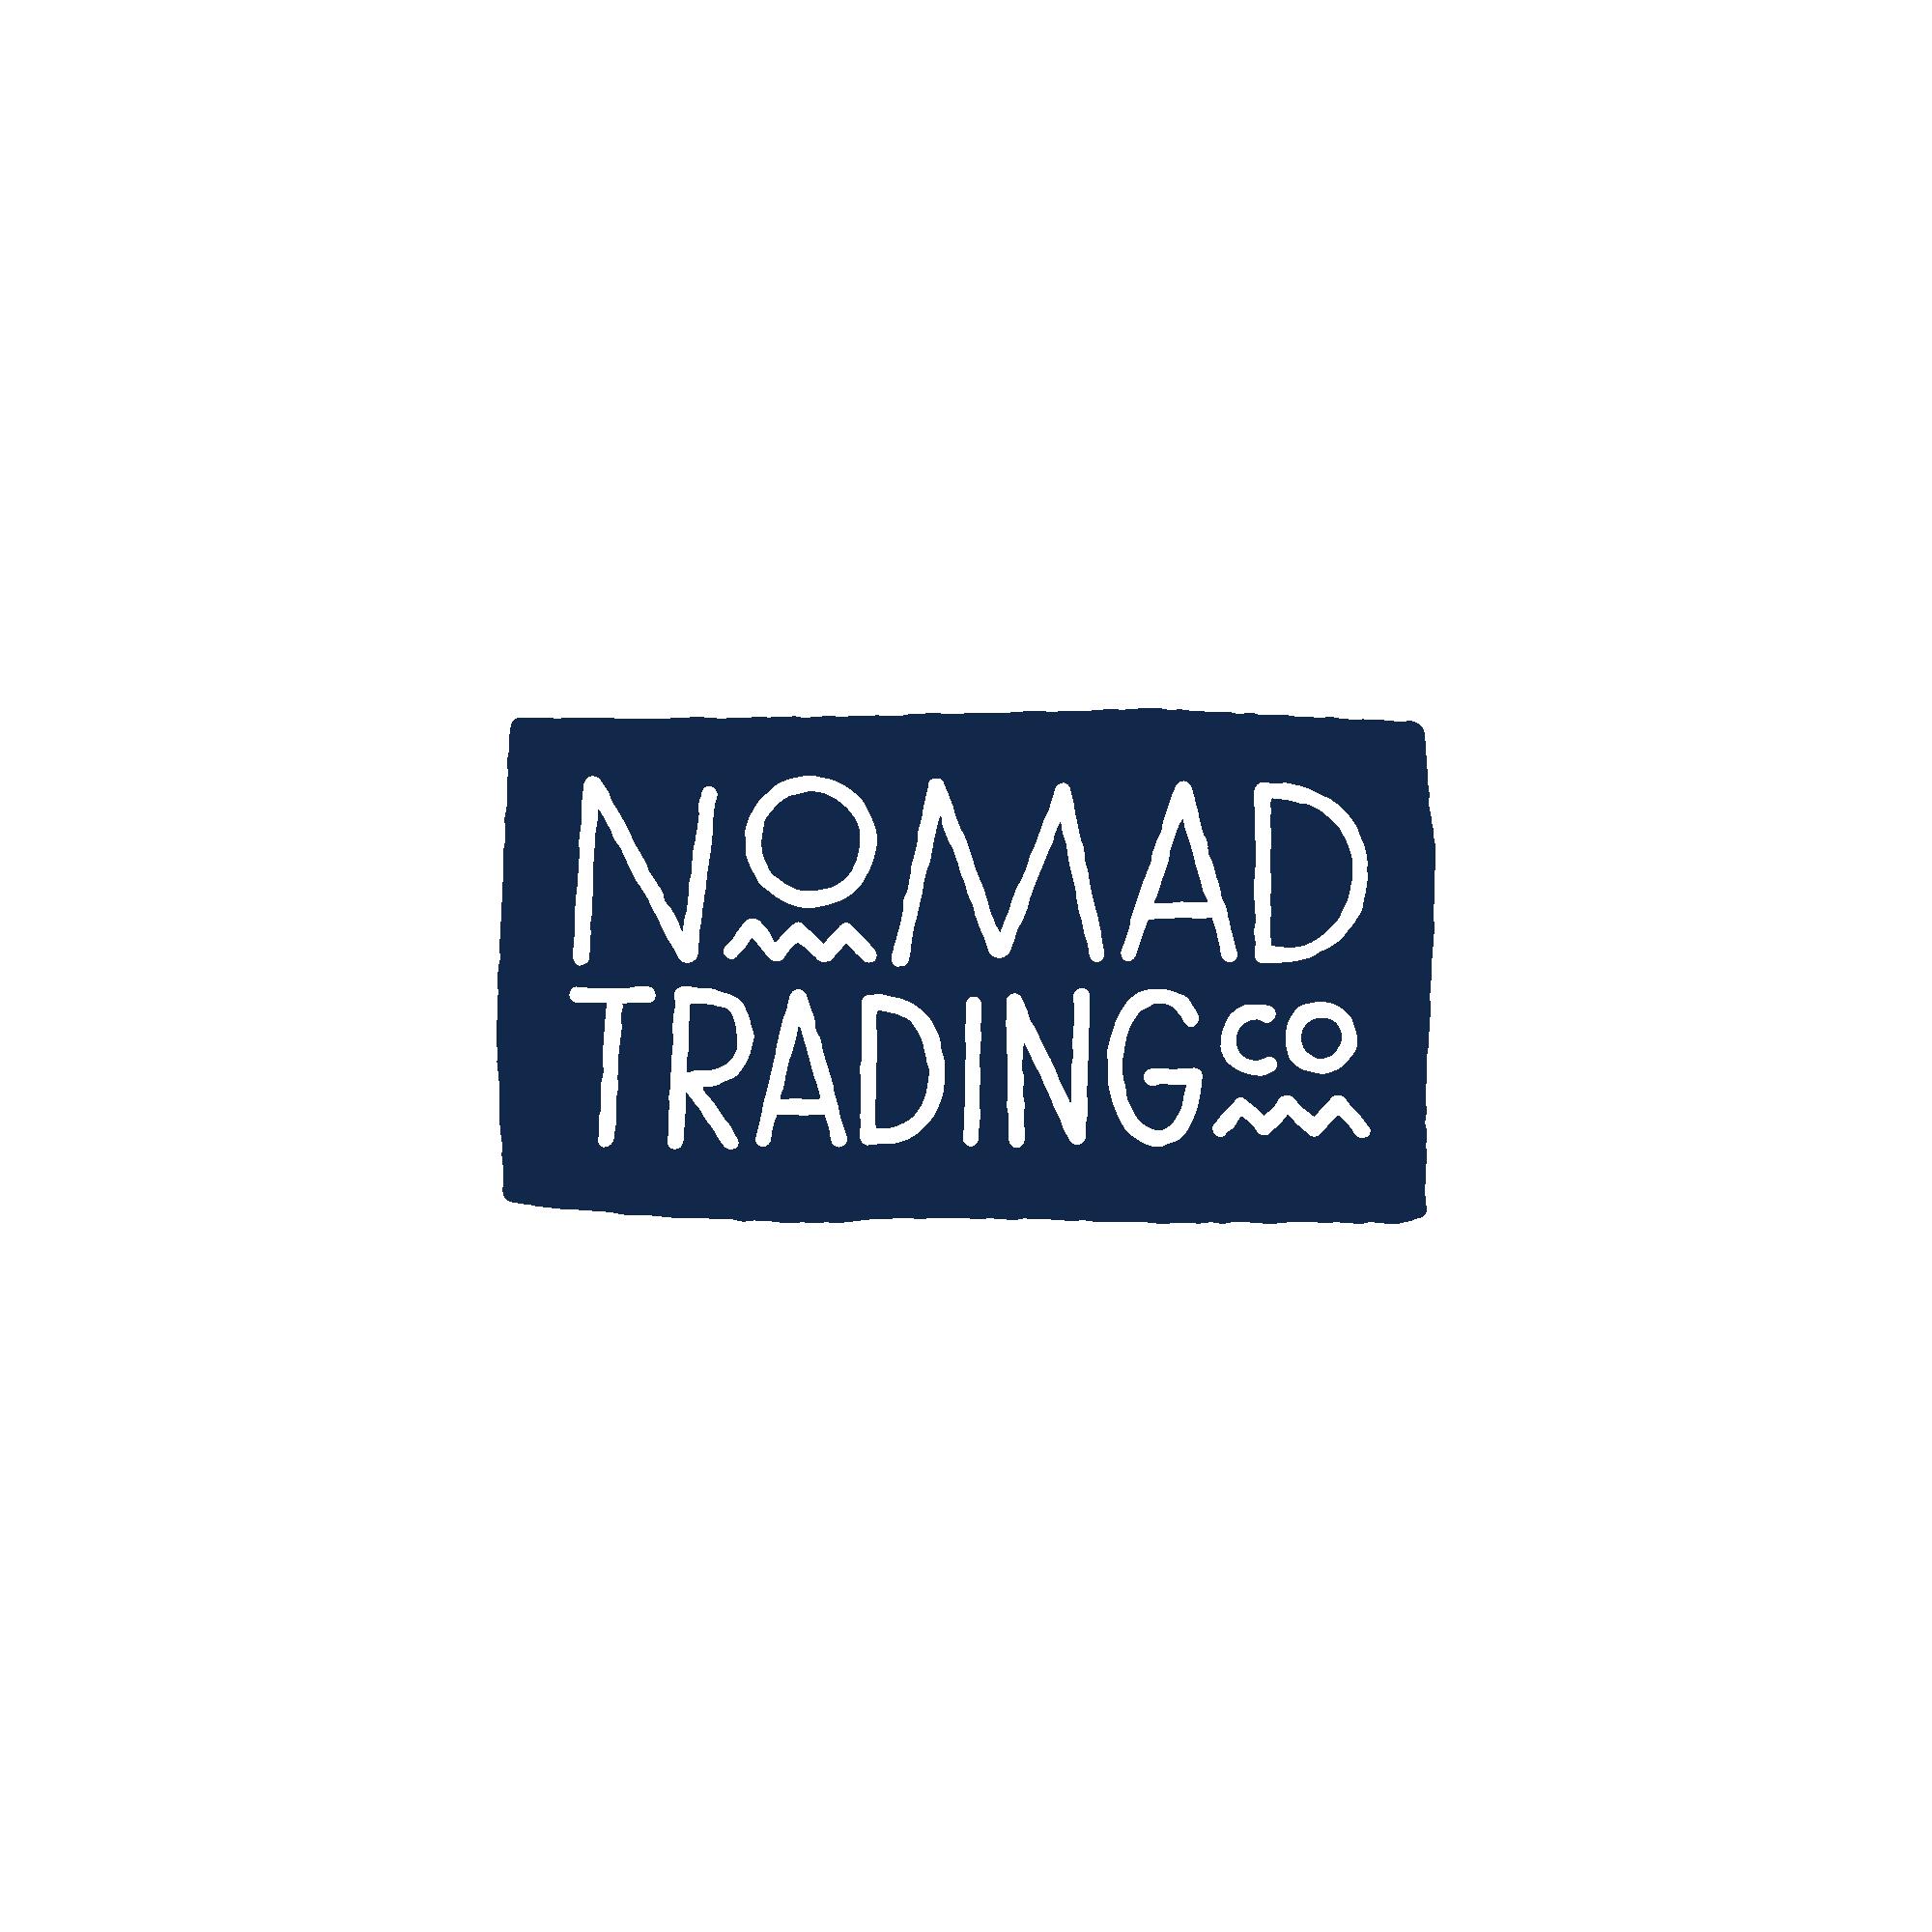 nomadtradingco.png